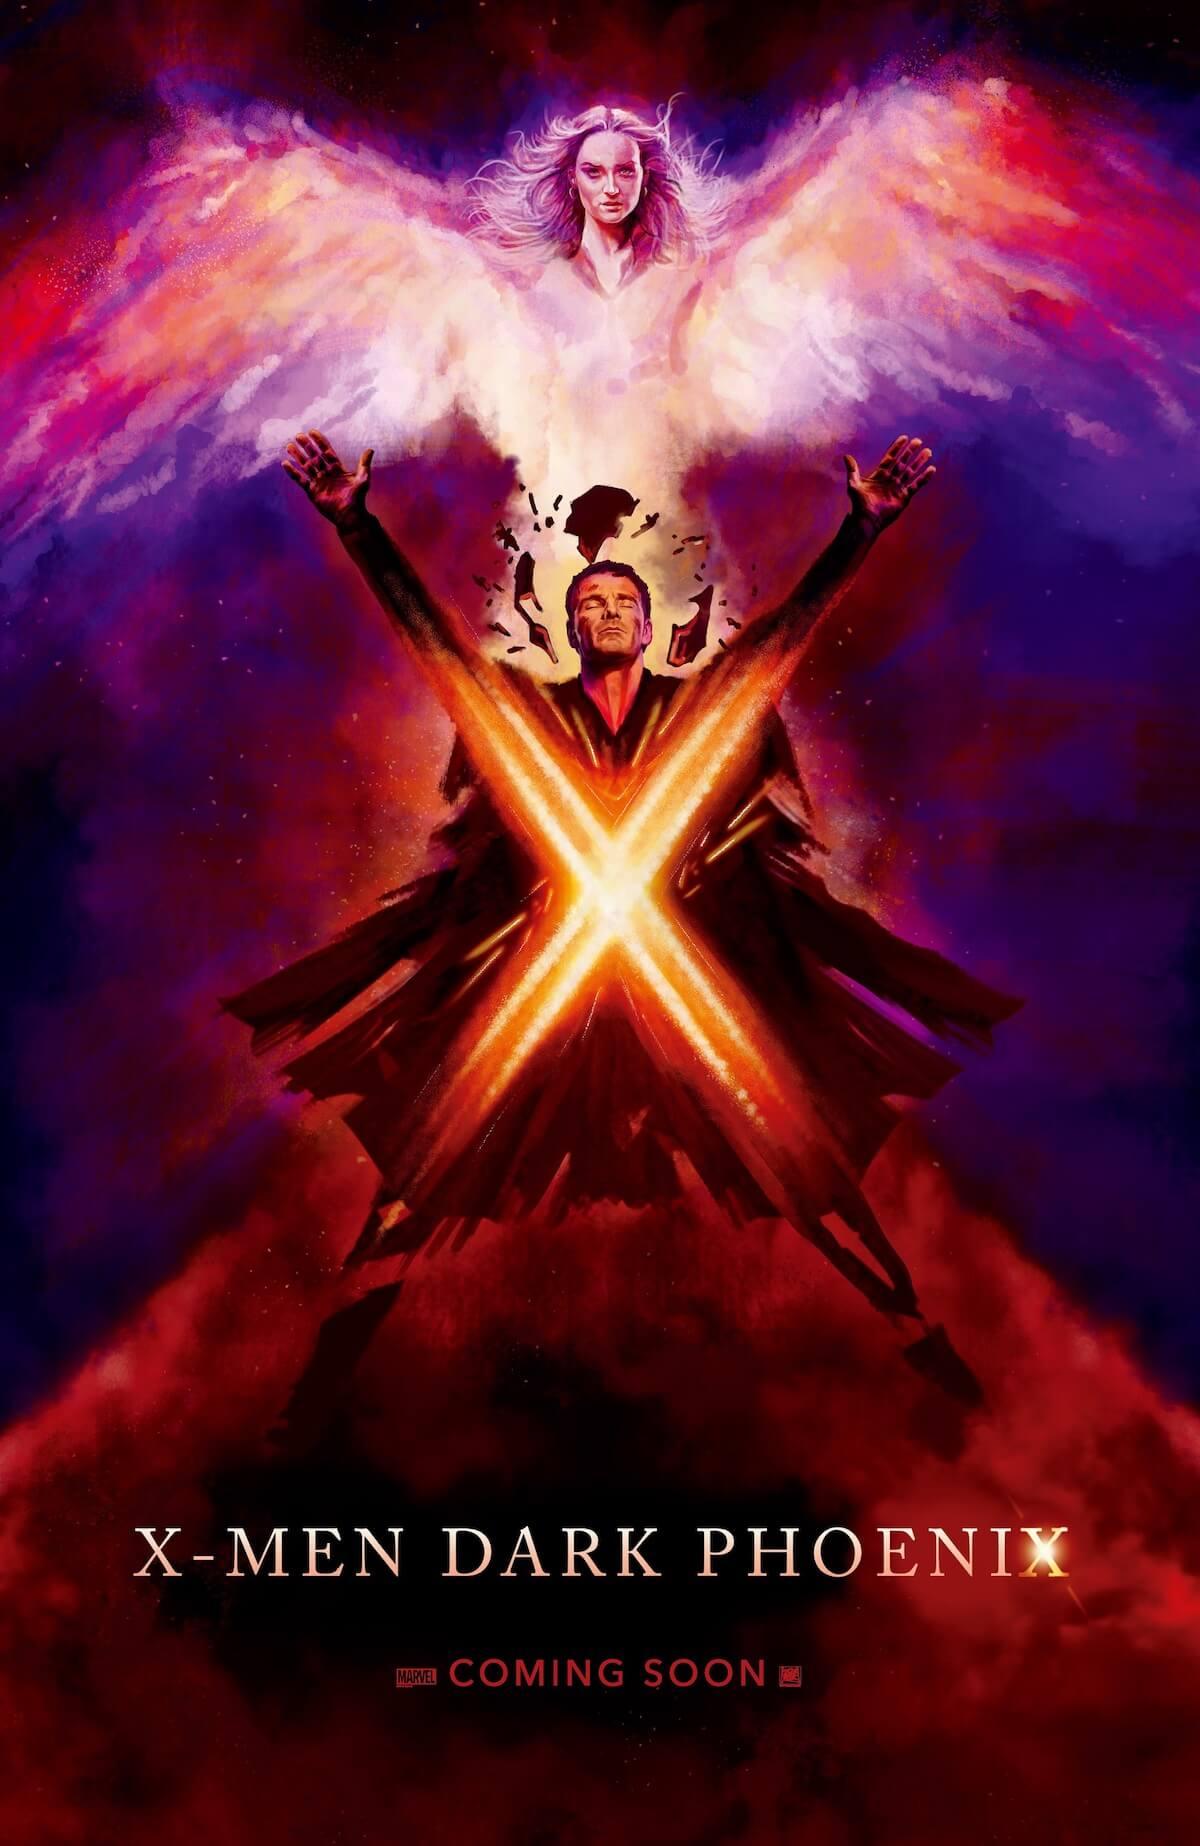 『X-MEN:ダーク・フェニックス』公開記念イベント<XーMEN DAY>が開催!ジーン役ソフィー・ターナーの特別映像解禁 film190517_xmenday_10